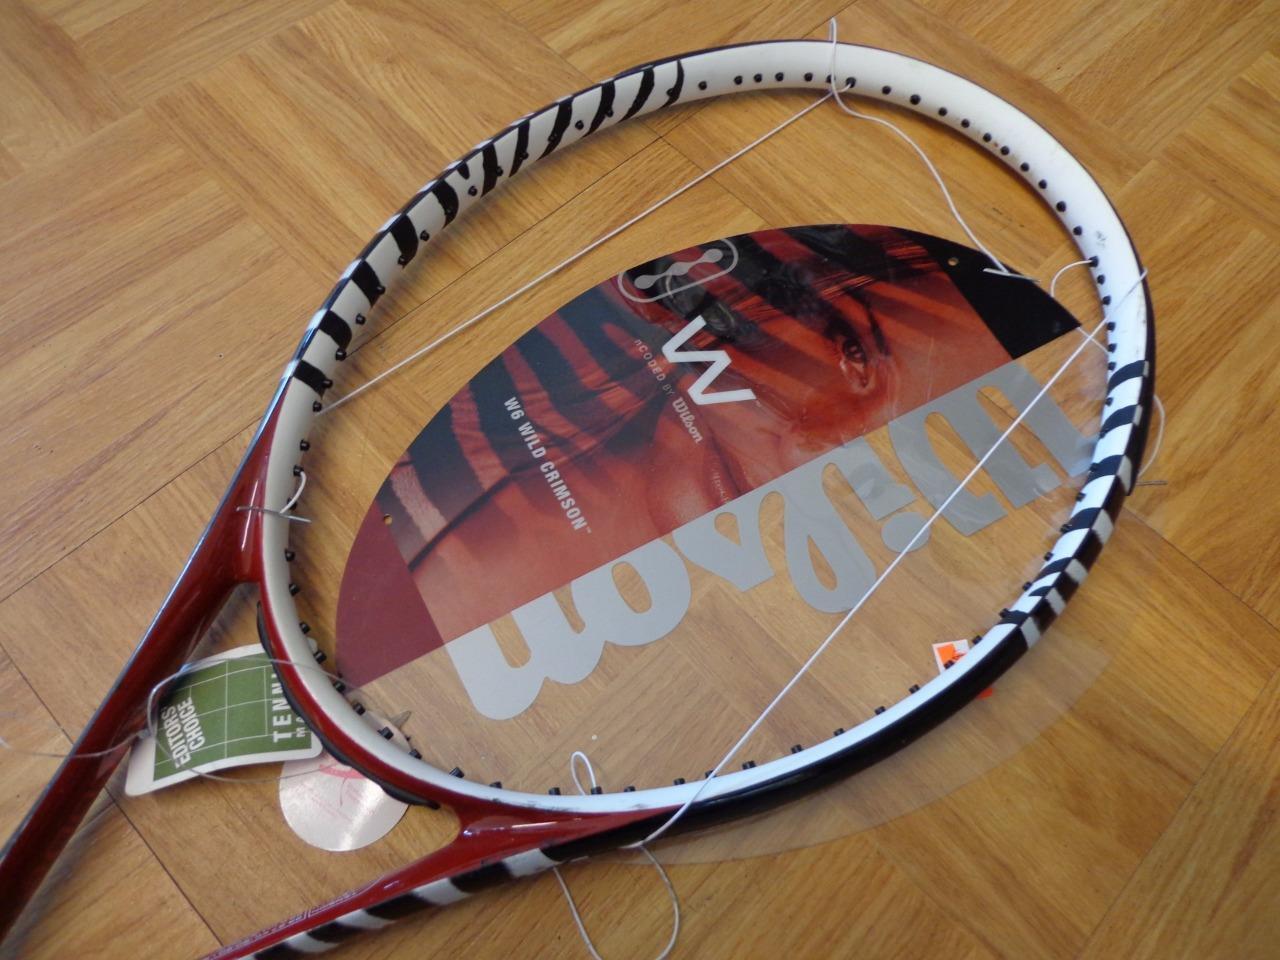 Nuevo Wilson W6 Wild carmesí 97 cabeza 4 1 1 1 2 Grip Tenis Raqueta 509ebe